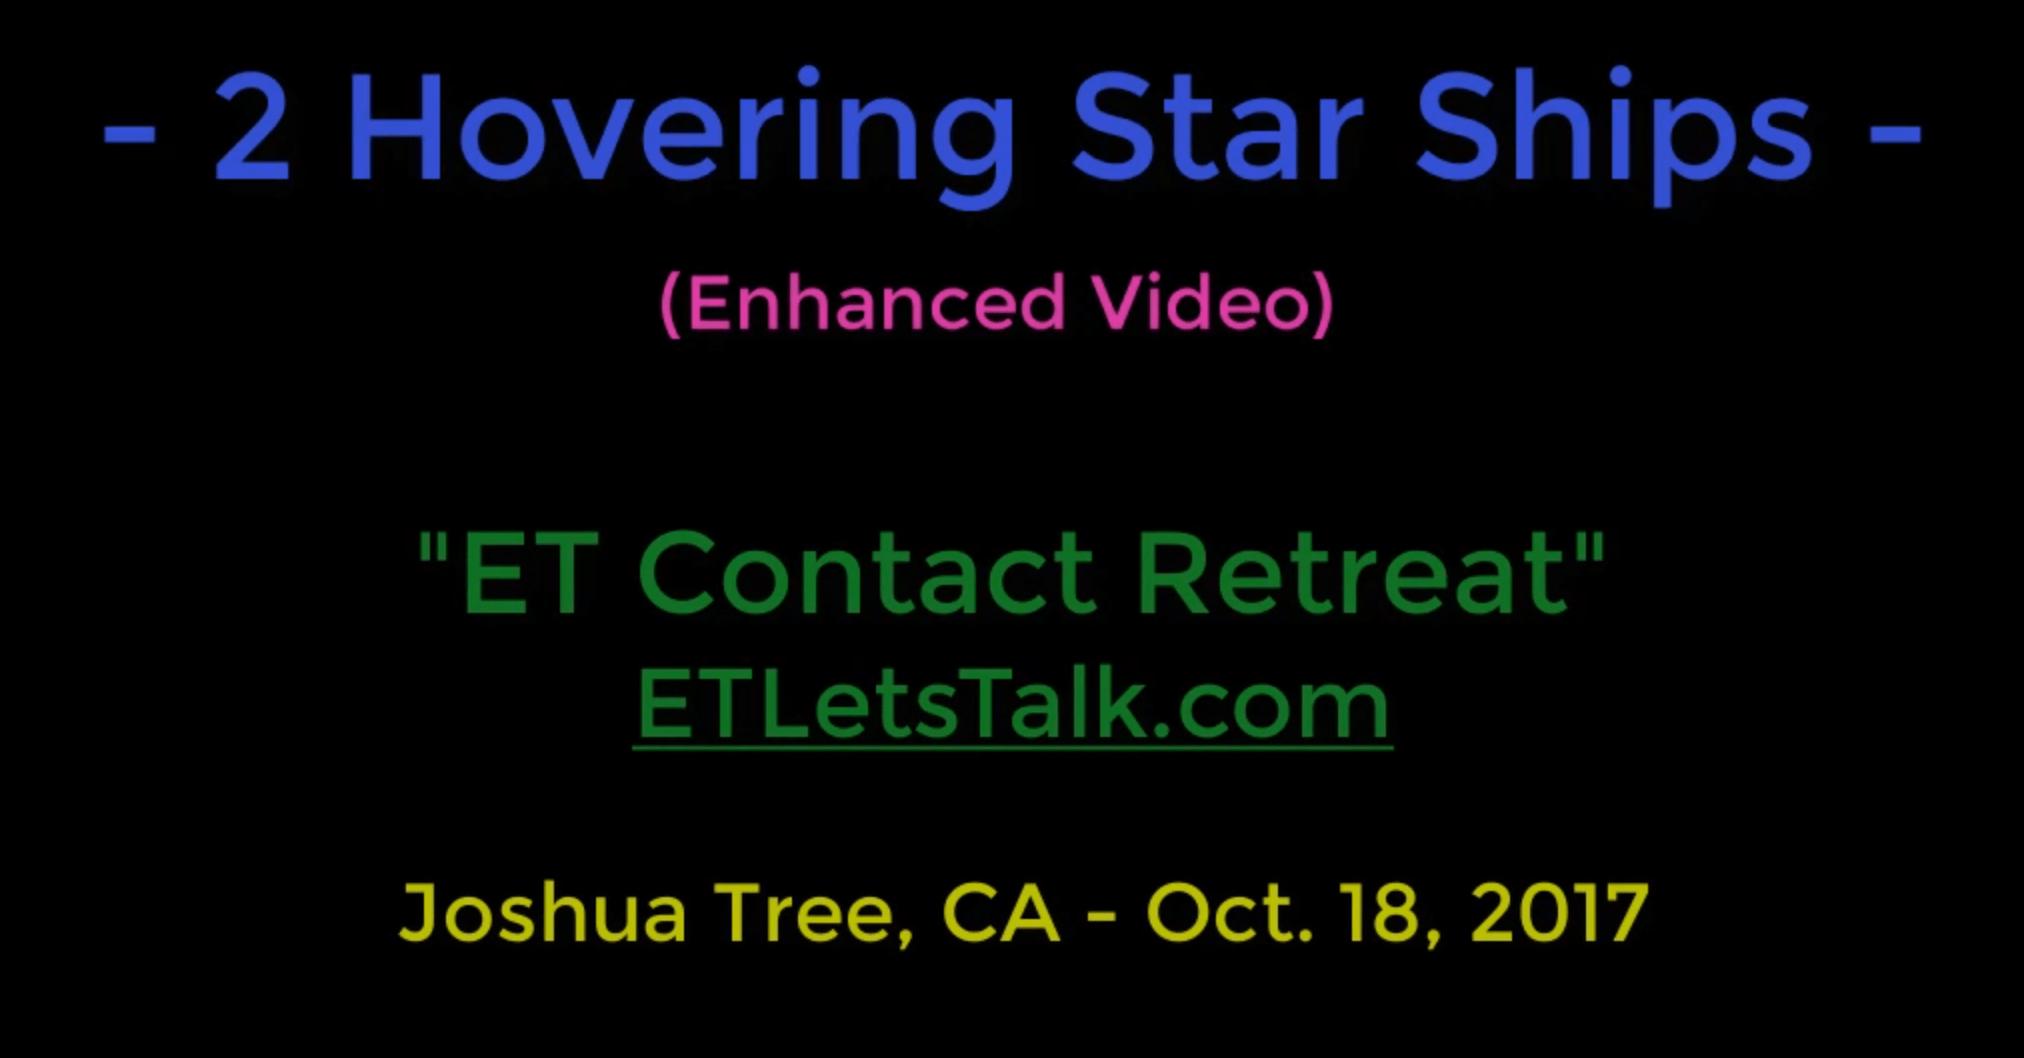 2 Hovering Star Ships enhanced video